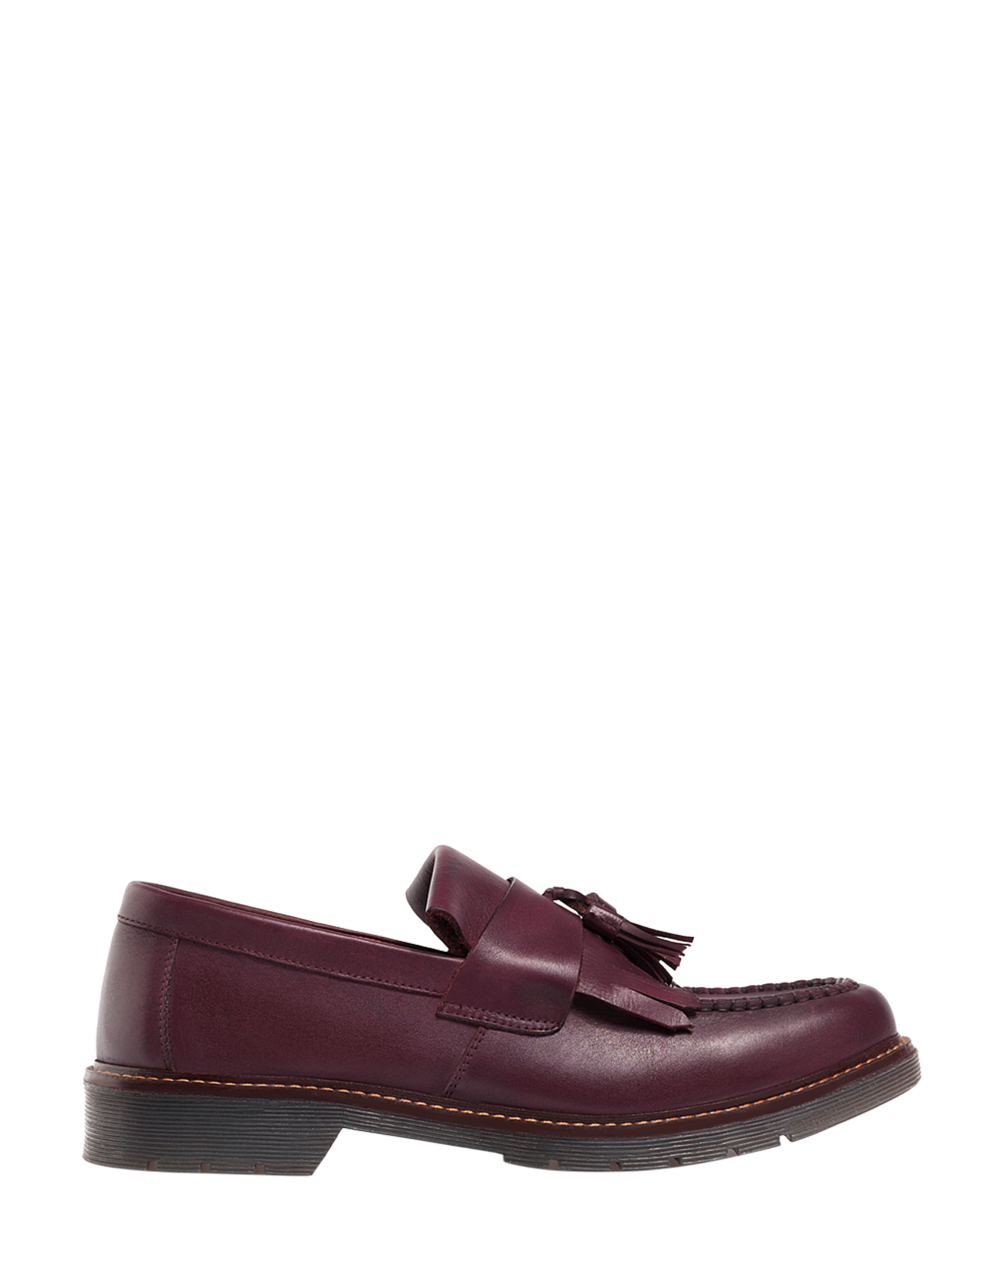 StradivariusMan_shoes (29).png